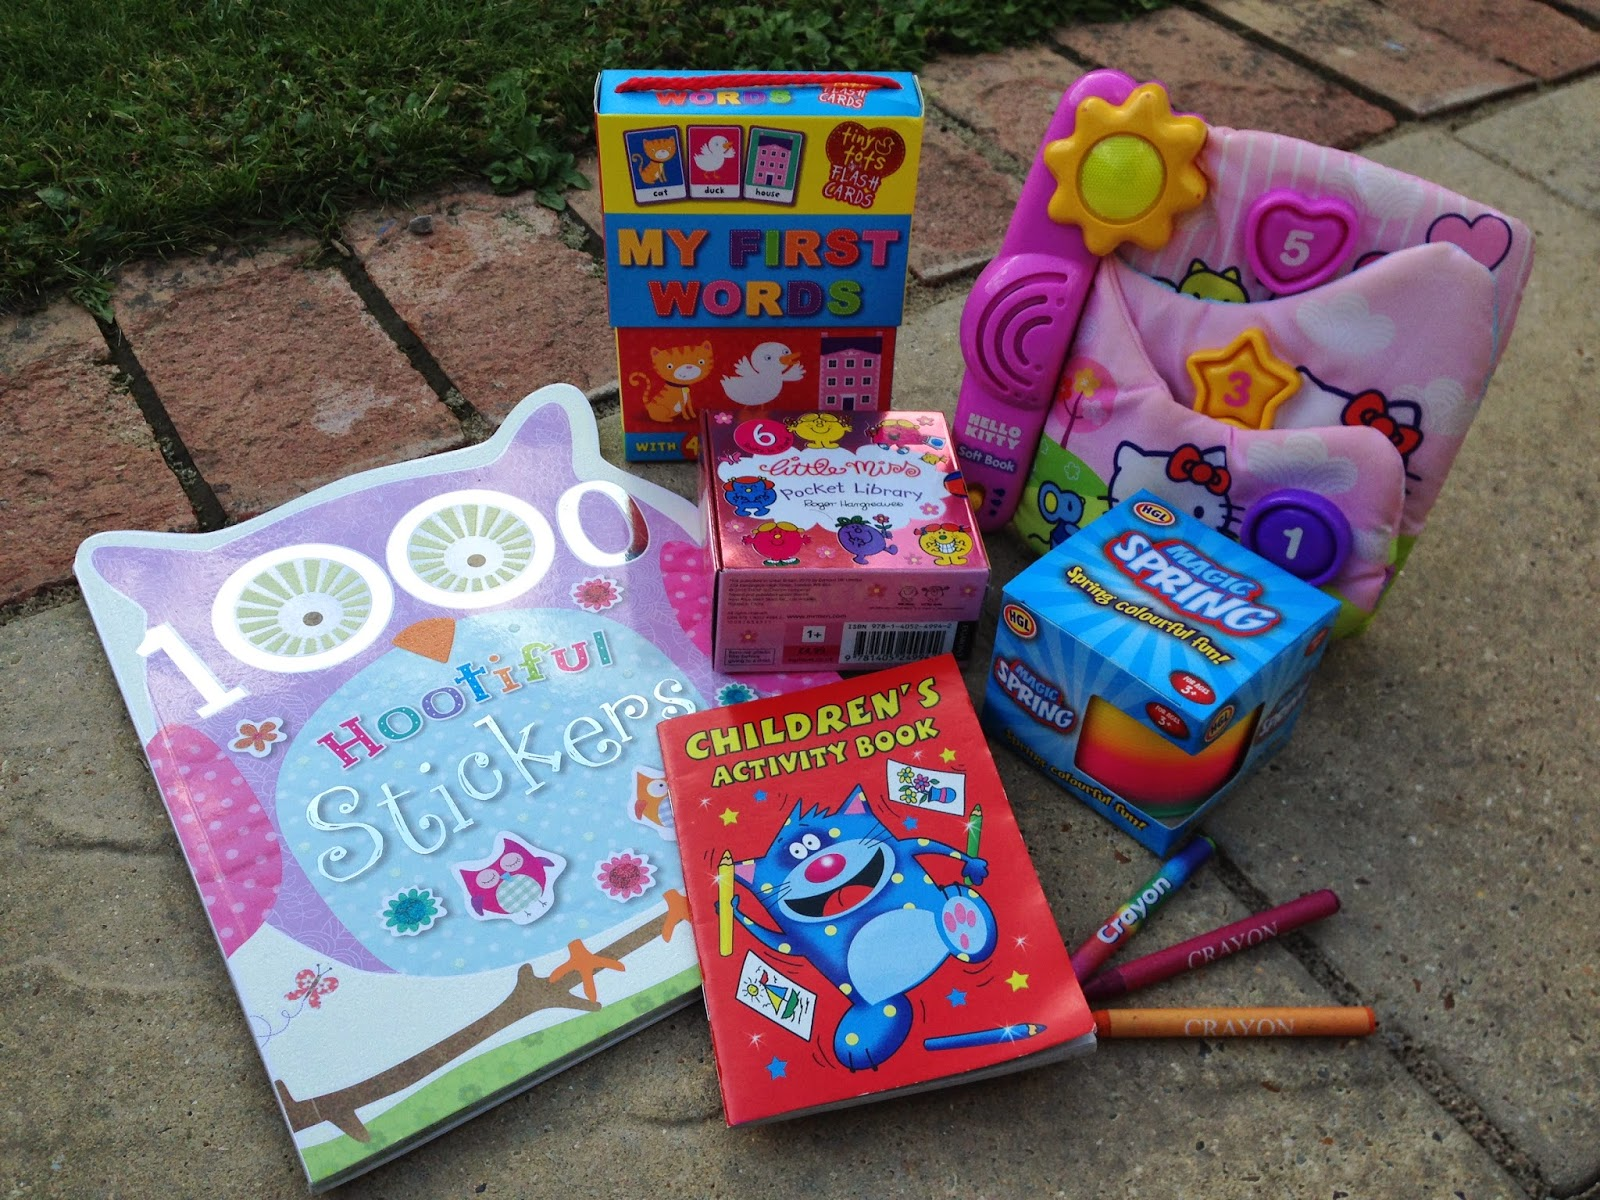 Sticker book, flash cards, slinky soft book, colouring book, card books